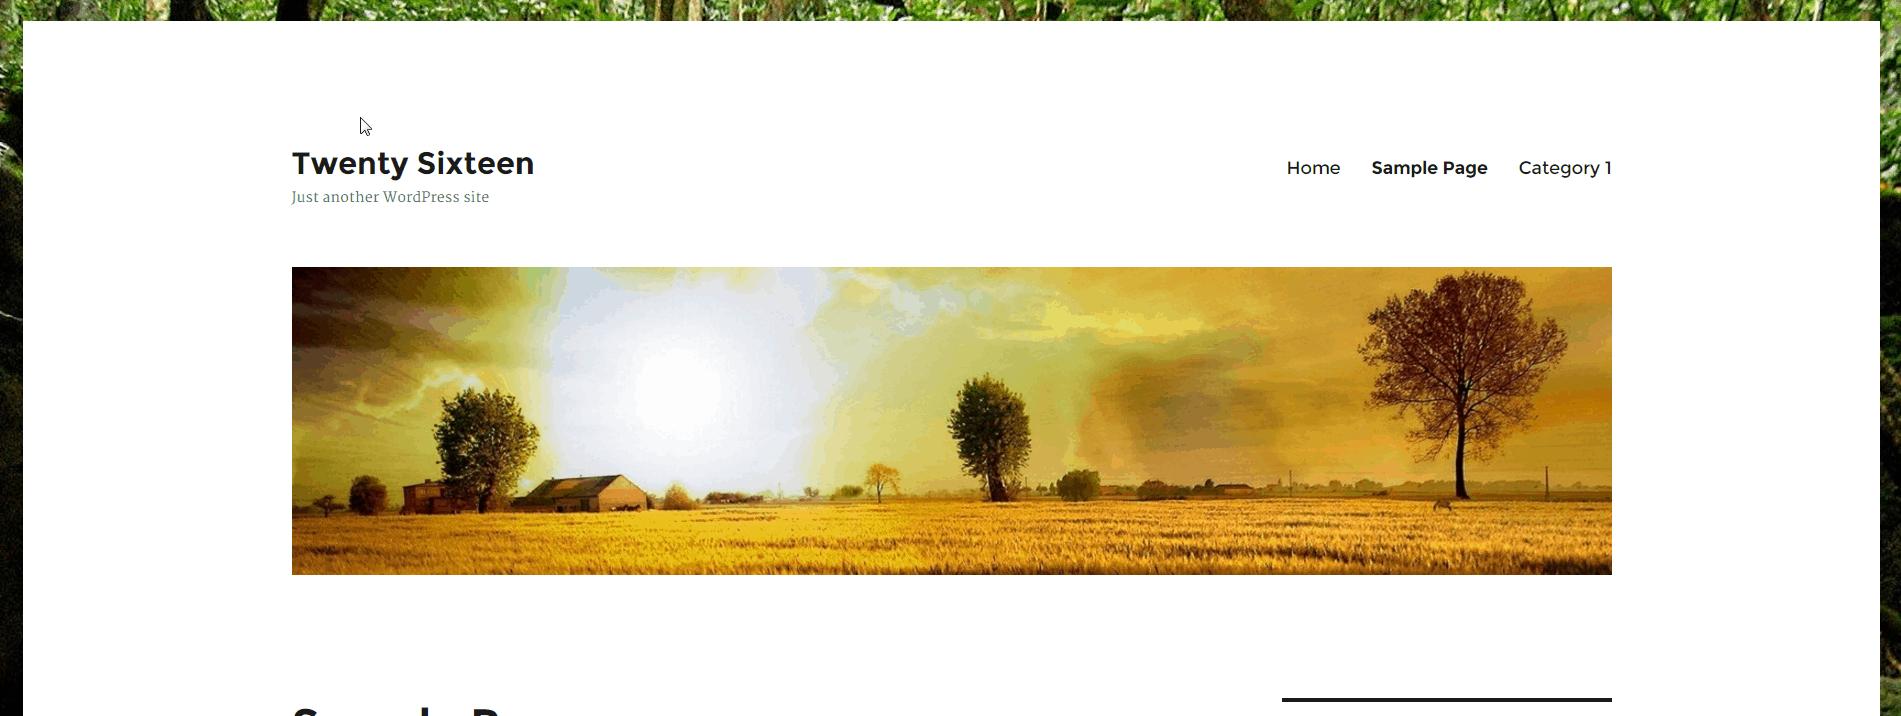 Background Image+Header Image